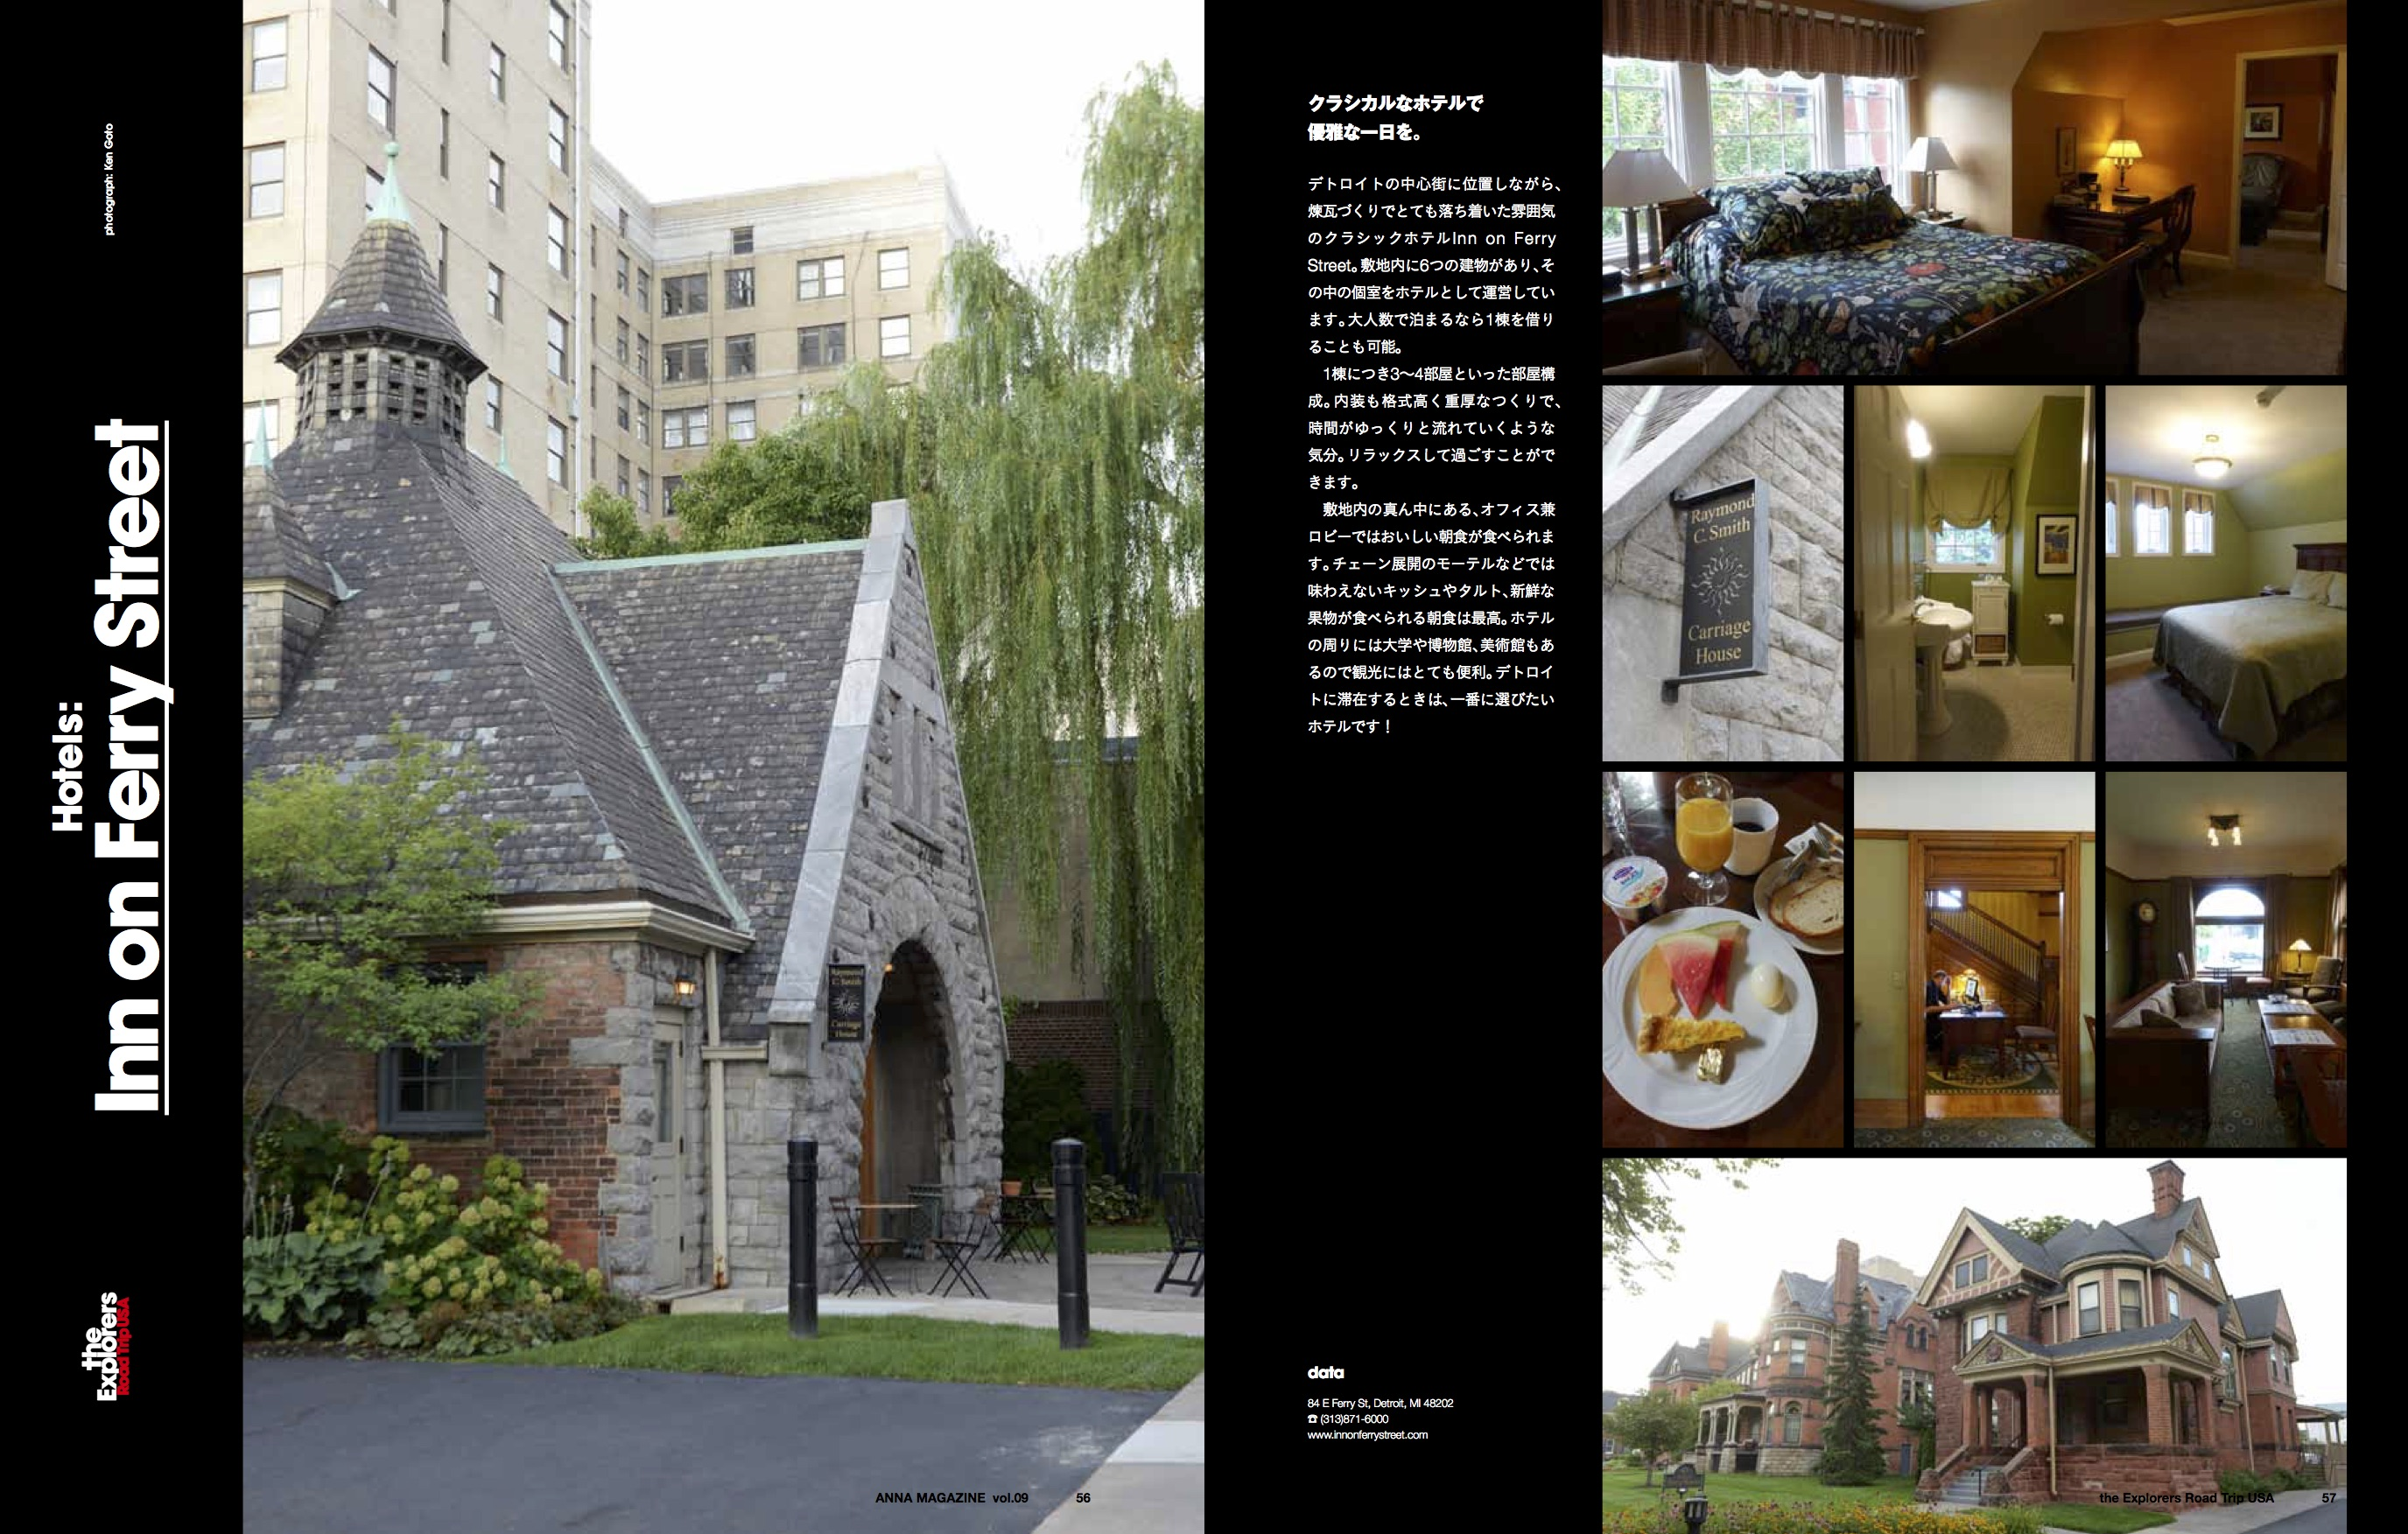 anna magazine vol.9 P28